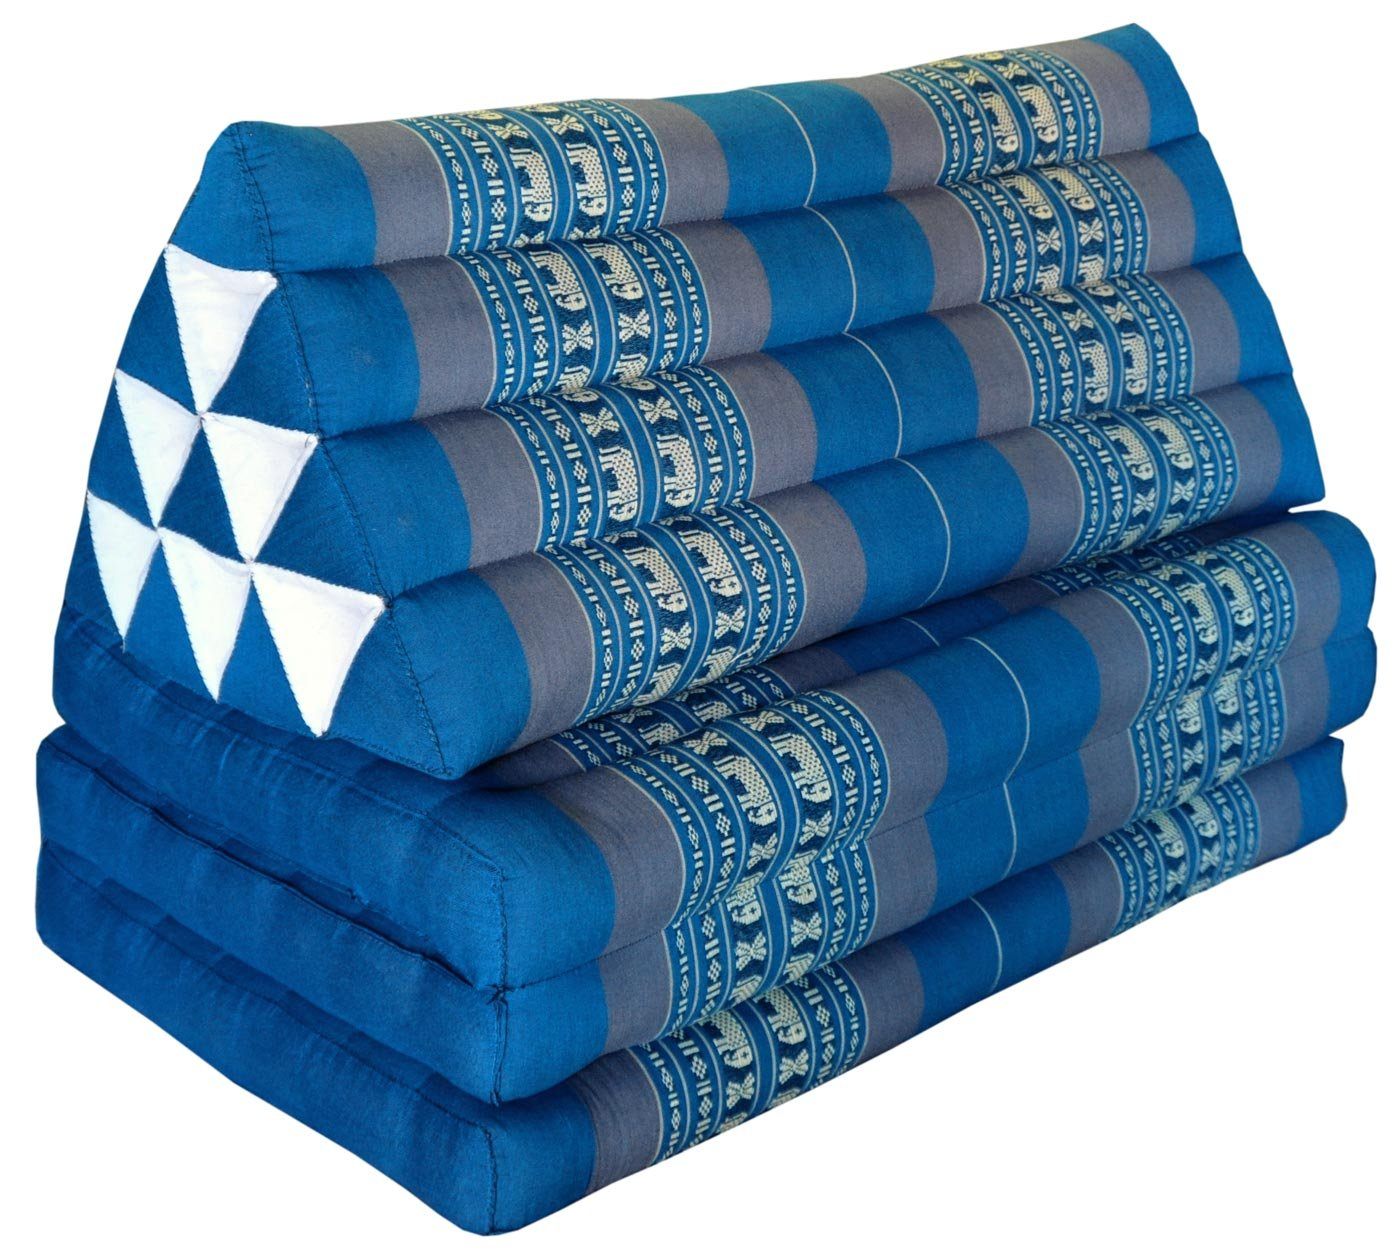 Thai triangle cushion/mattress XXL, with 3 folding seats, blue/grey, sofa, relaxation, beach, pool, meditation, yoga, made in Thailand. (81718) by Wilai GmbH